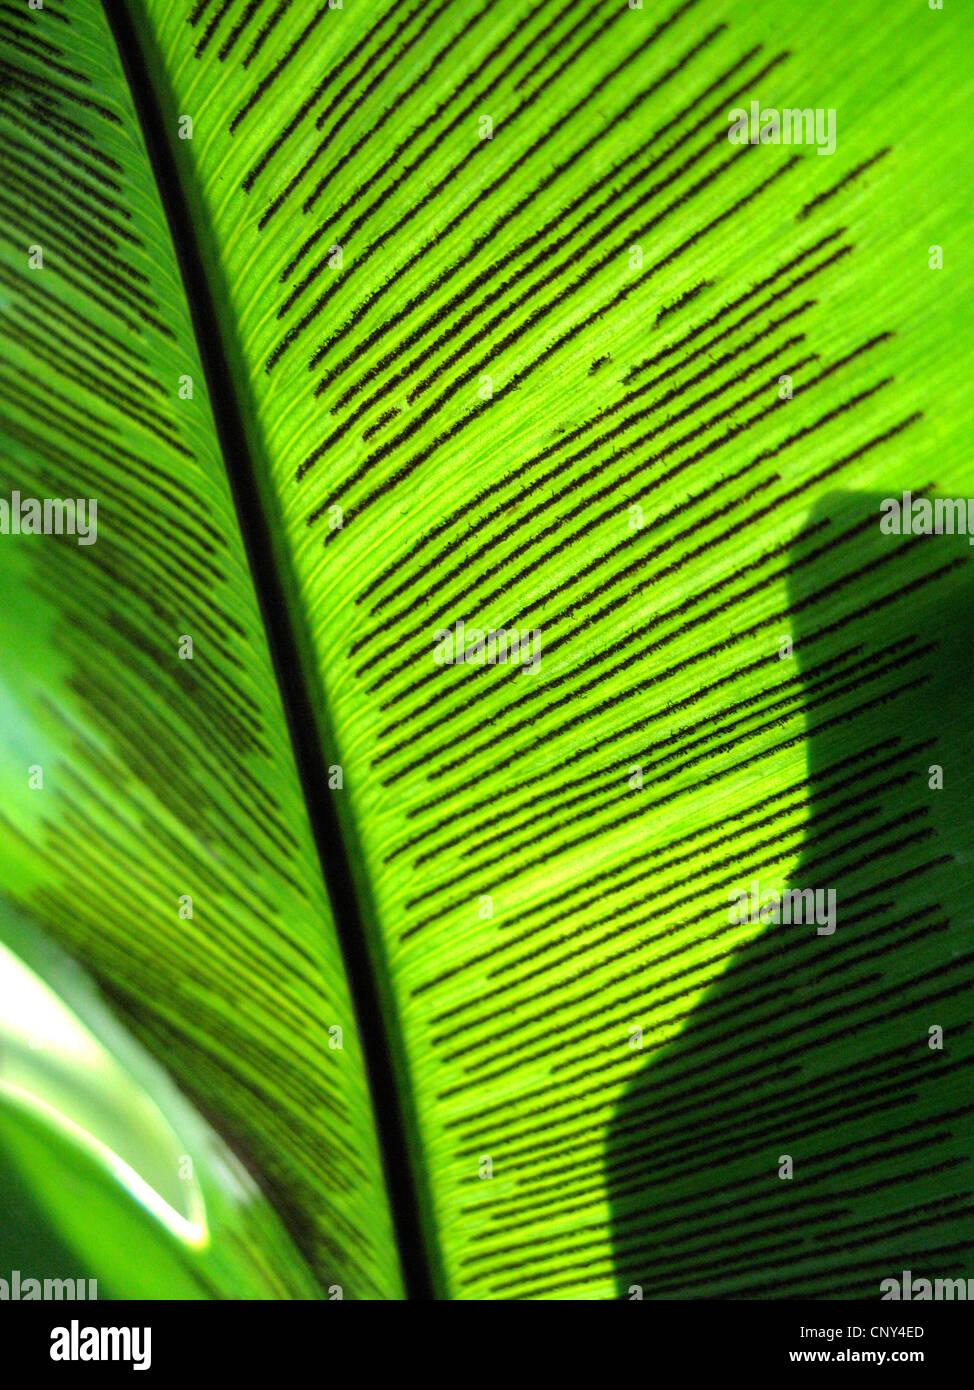 bird's nest fern (Asplenium nidus), detail of leaf with sporangia - Stock Image